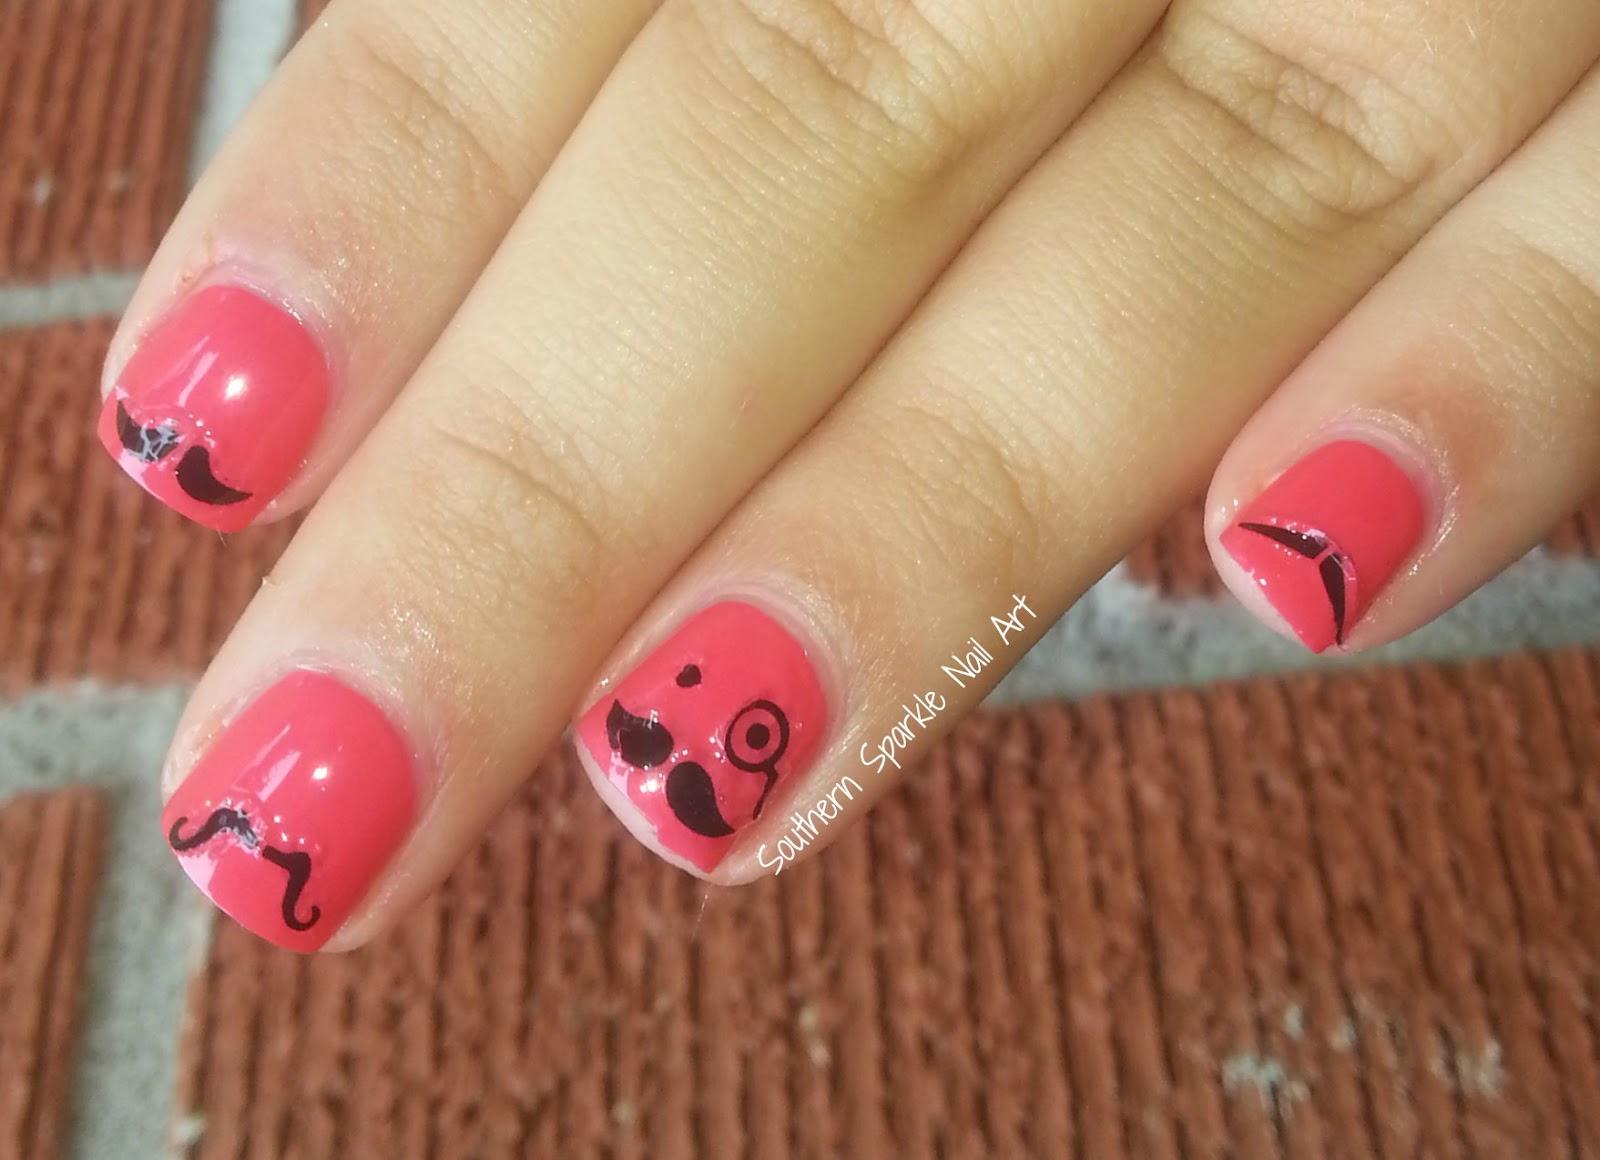 Southern Sparkle Nail Art July 2014